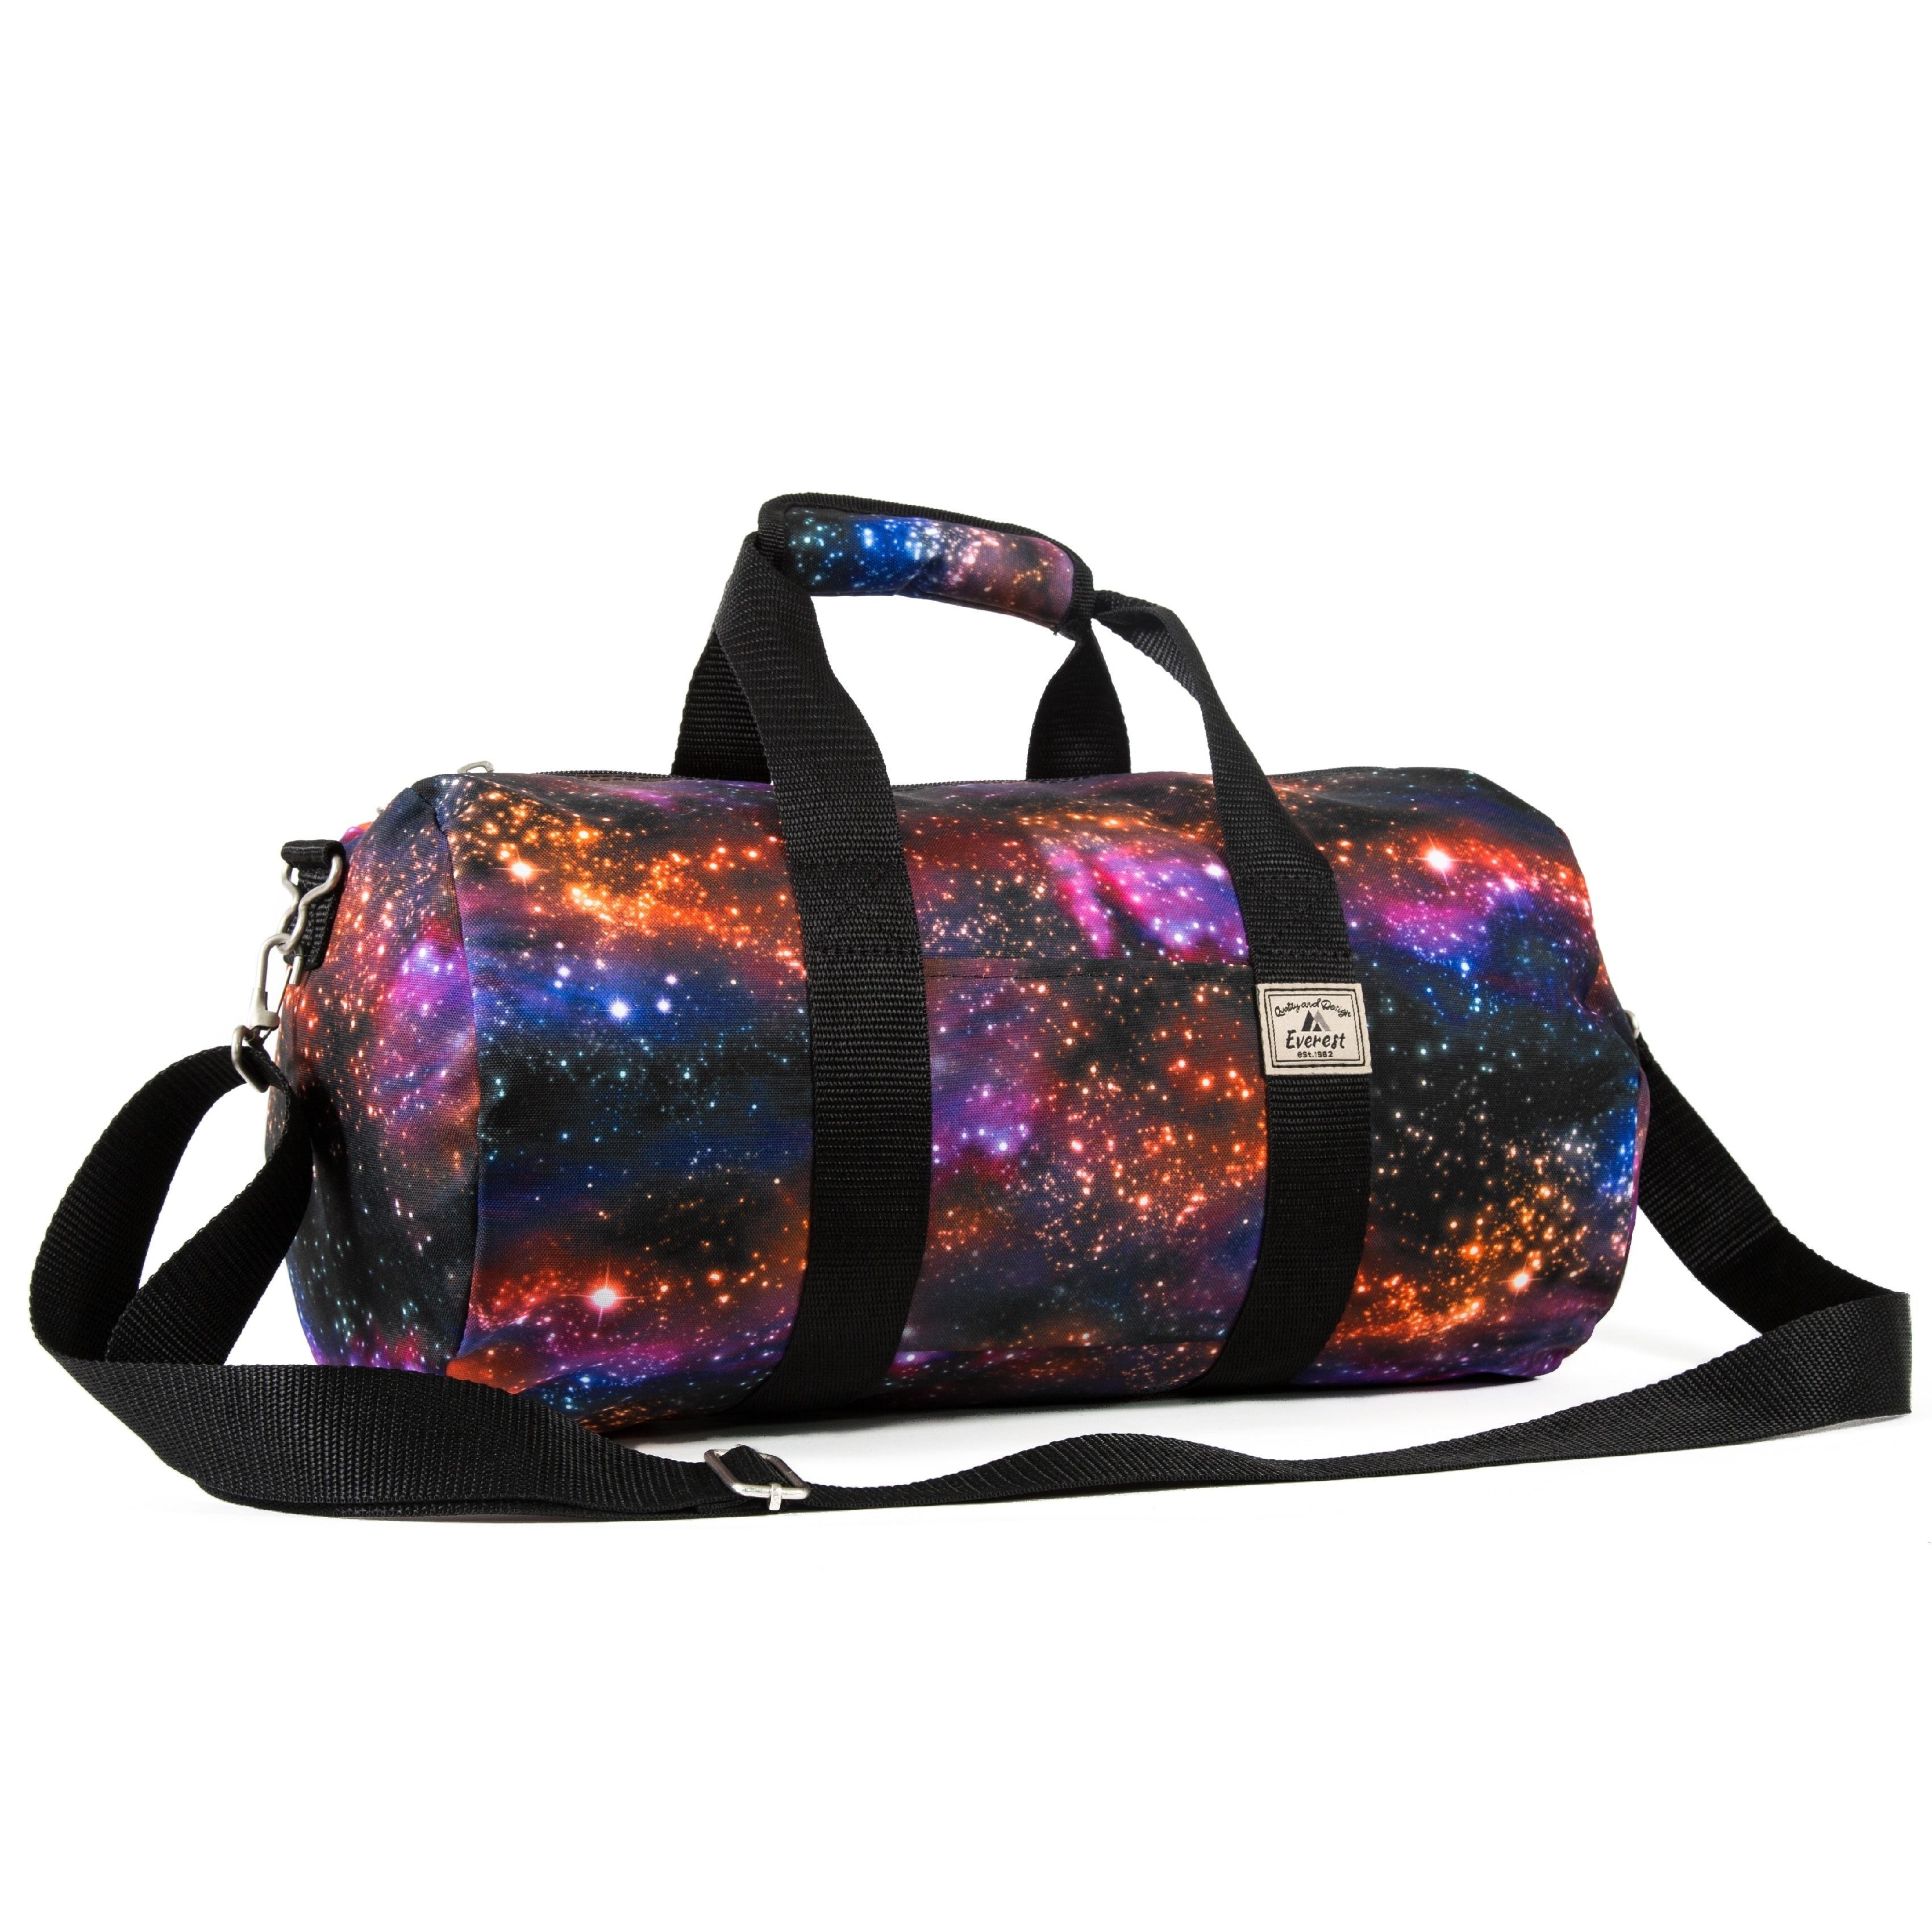 0a106d32cf Everest Galaxy Multicolored 16-inch Round Duffel Bag 742065010890